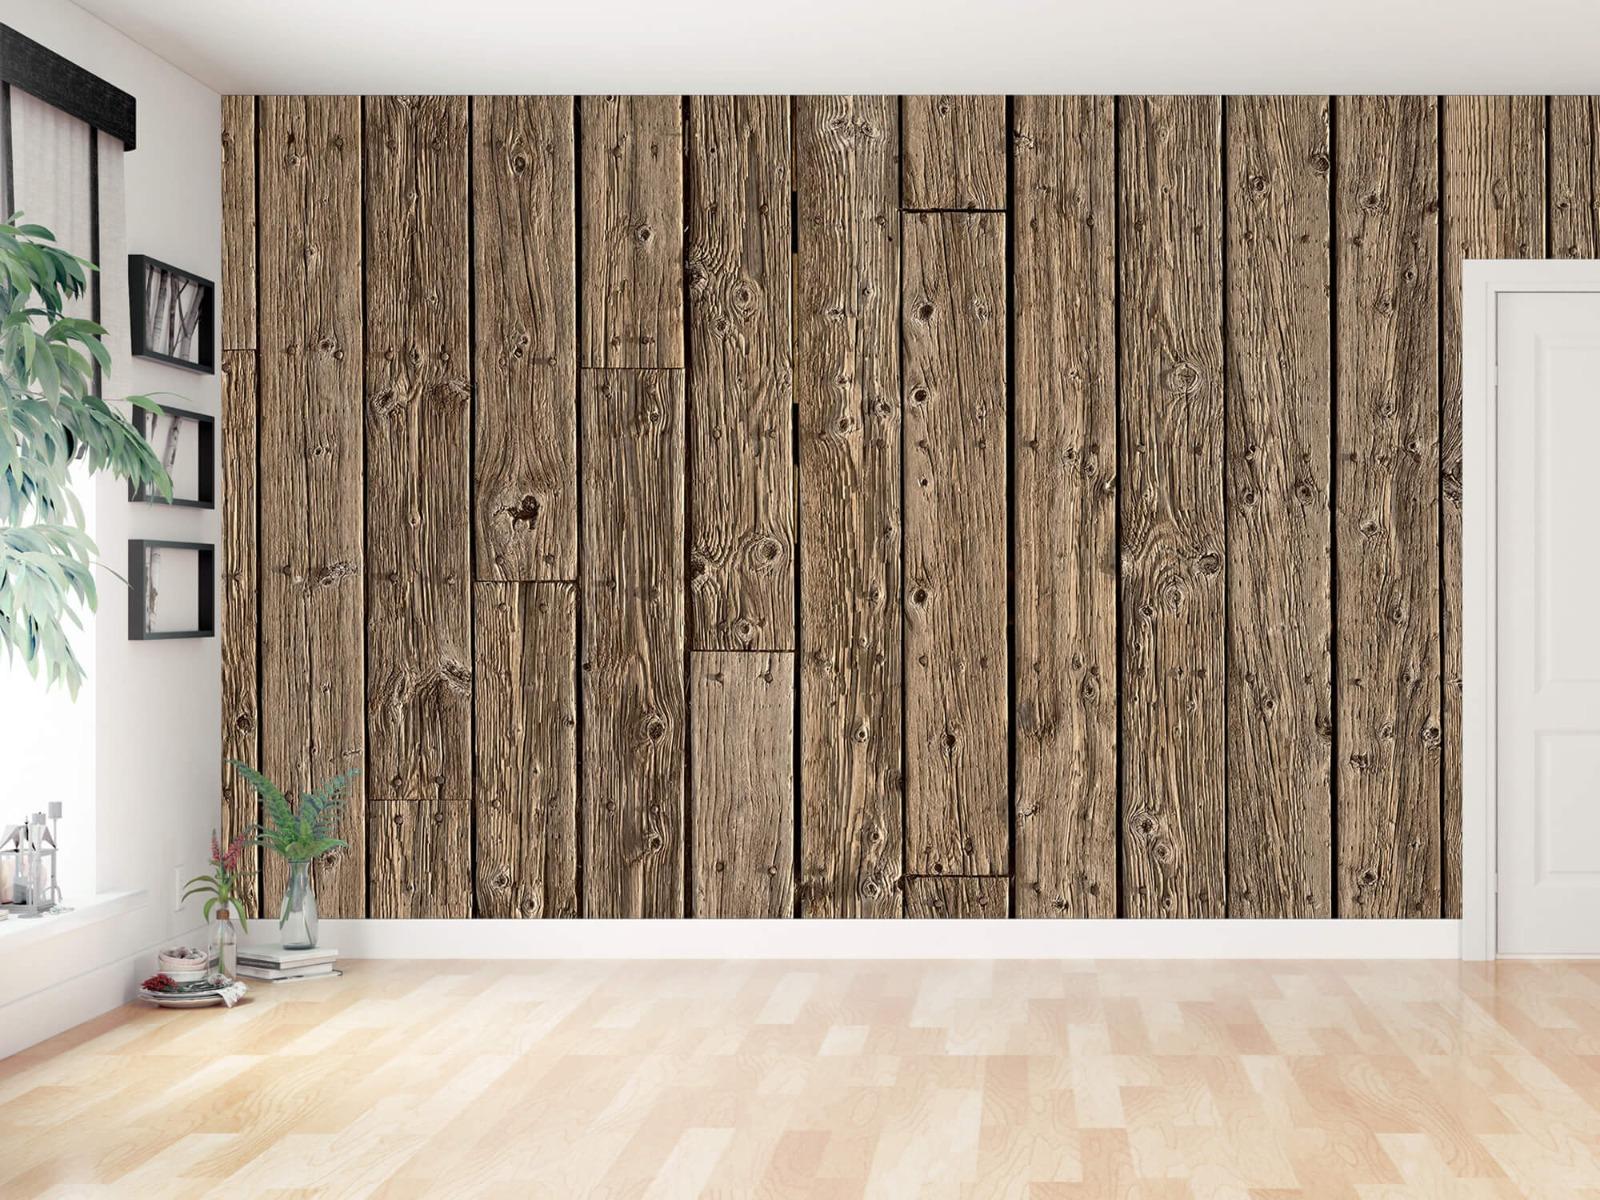 Hout behang - Oud hout - Wallexclusive - Slaapkamer 12